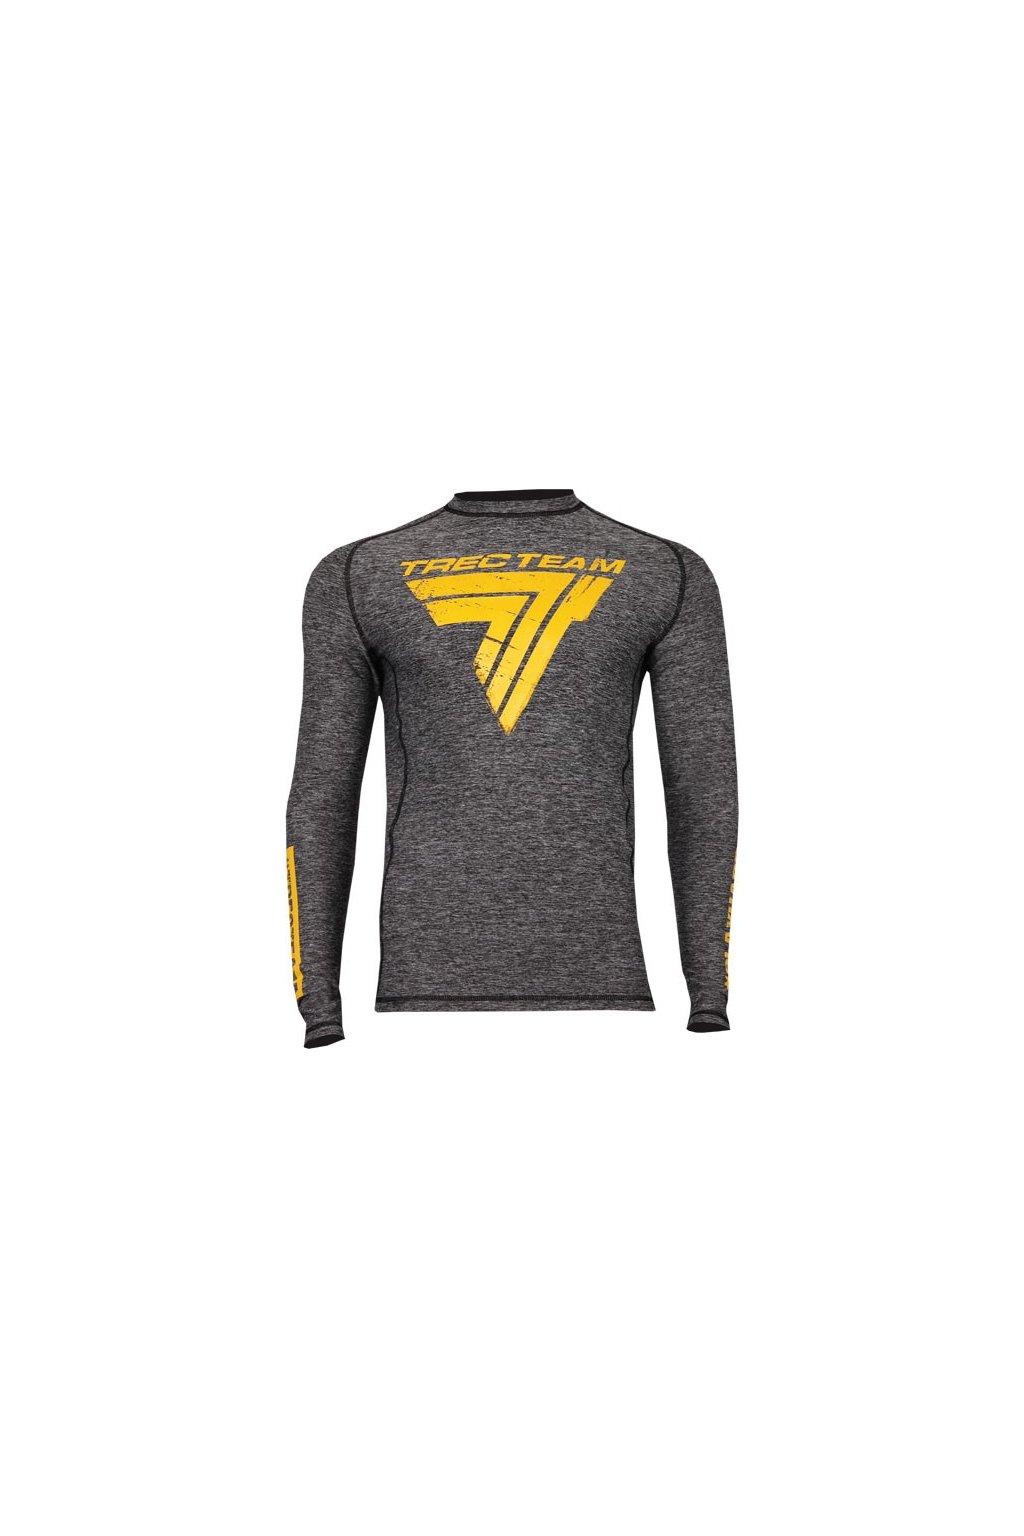 TrecWear Rash tričko 017